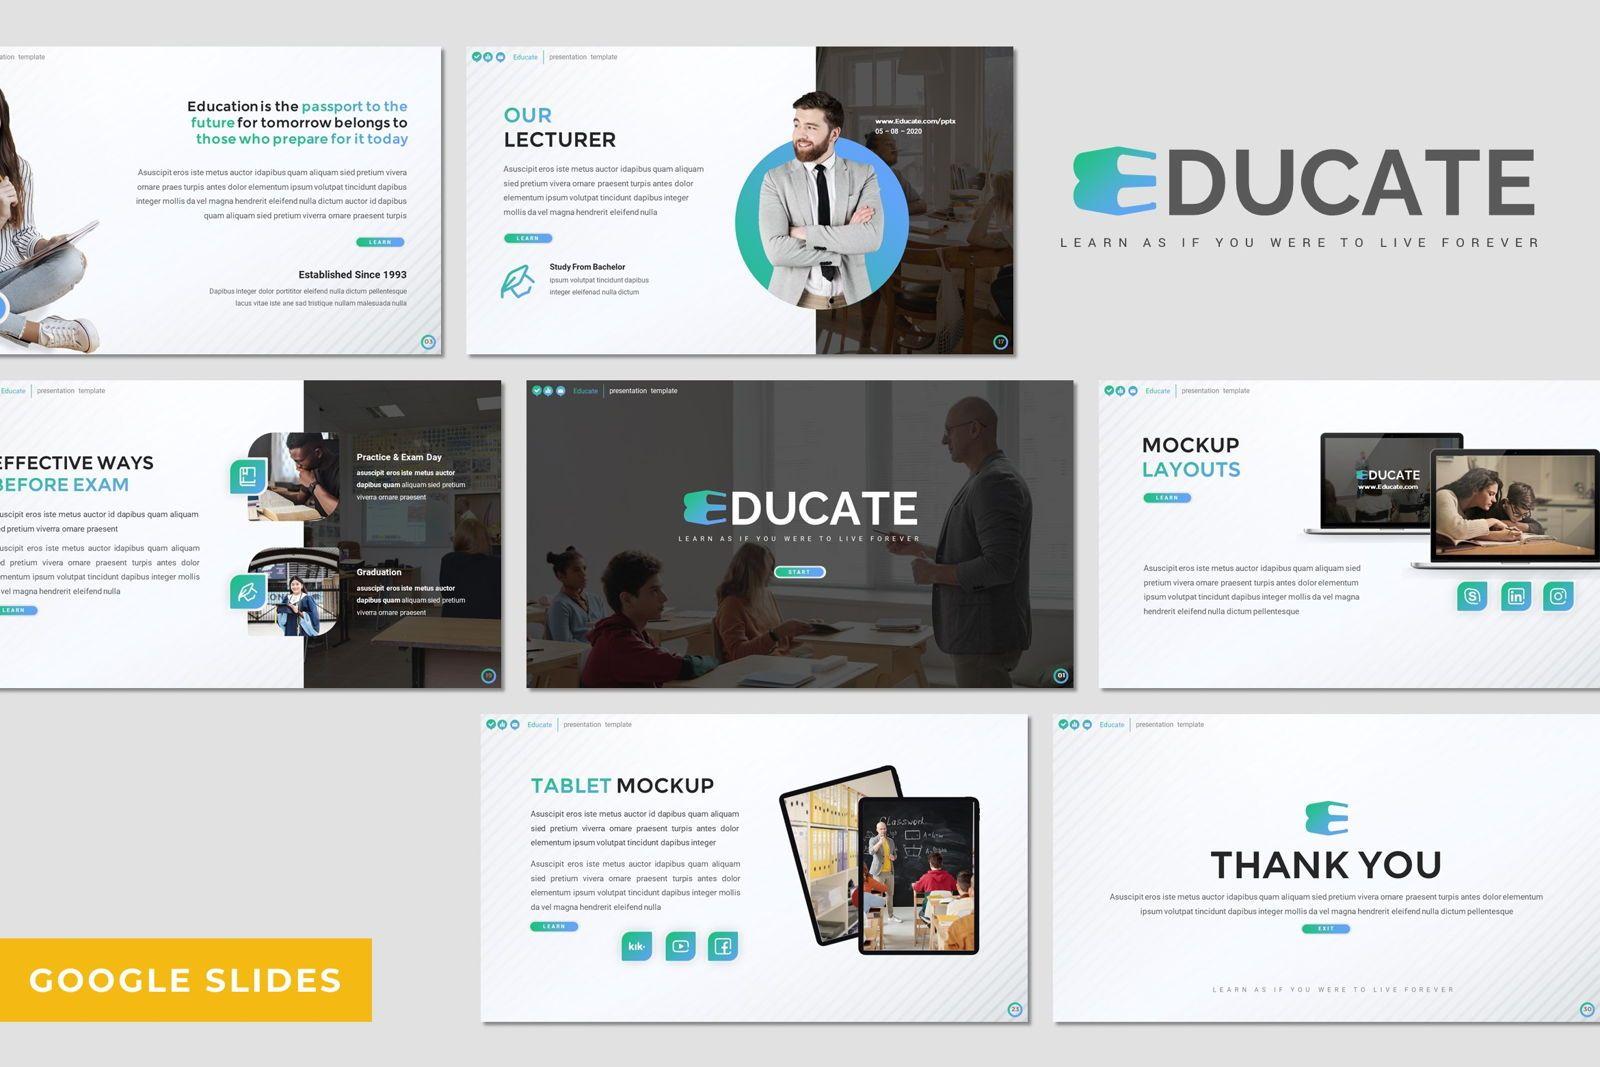 Educate - Google Slides Template, 08052, Presentation Templates — PoweredTemplate.com